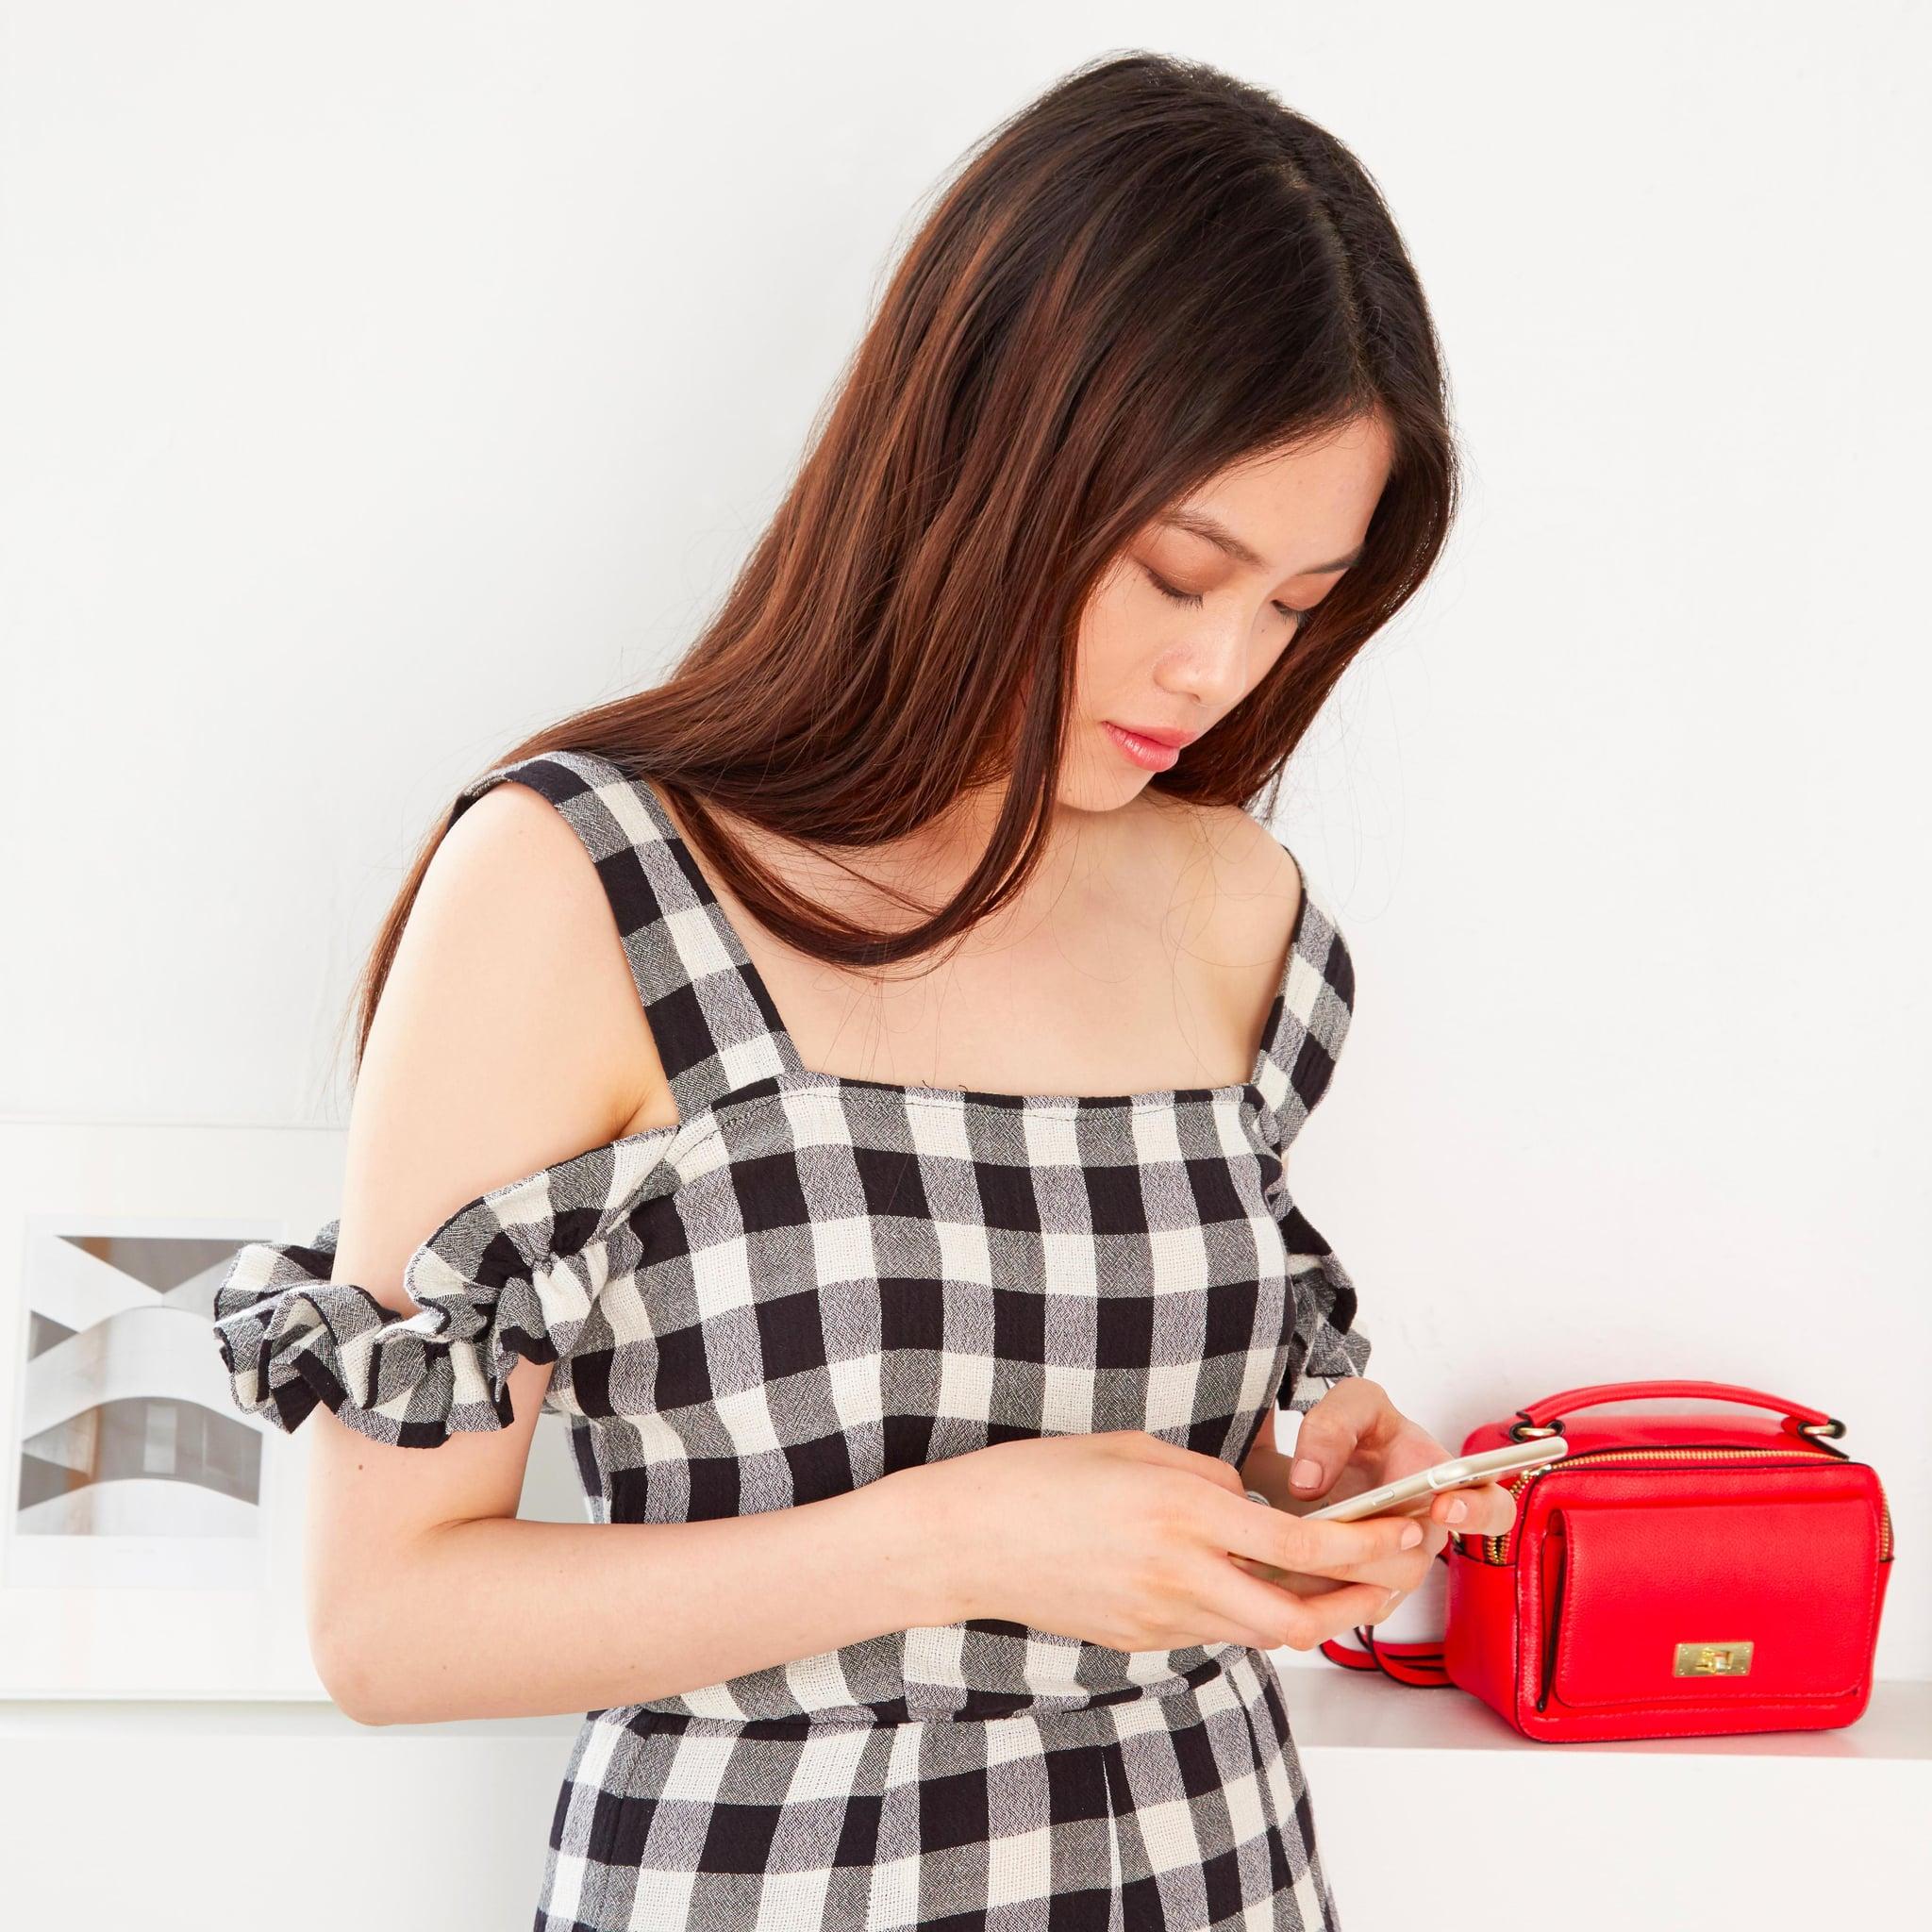 ccdaff3fc70b0 Where to Shop in Your 20s | POPSUGAR Fashion